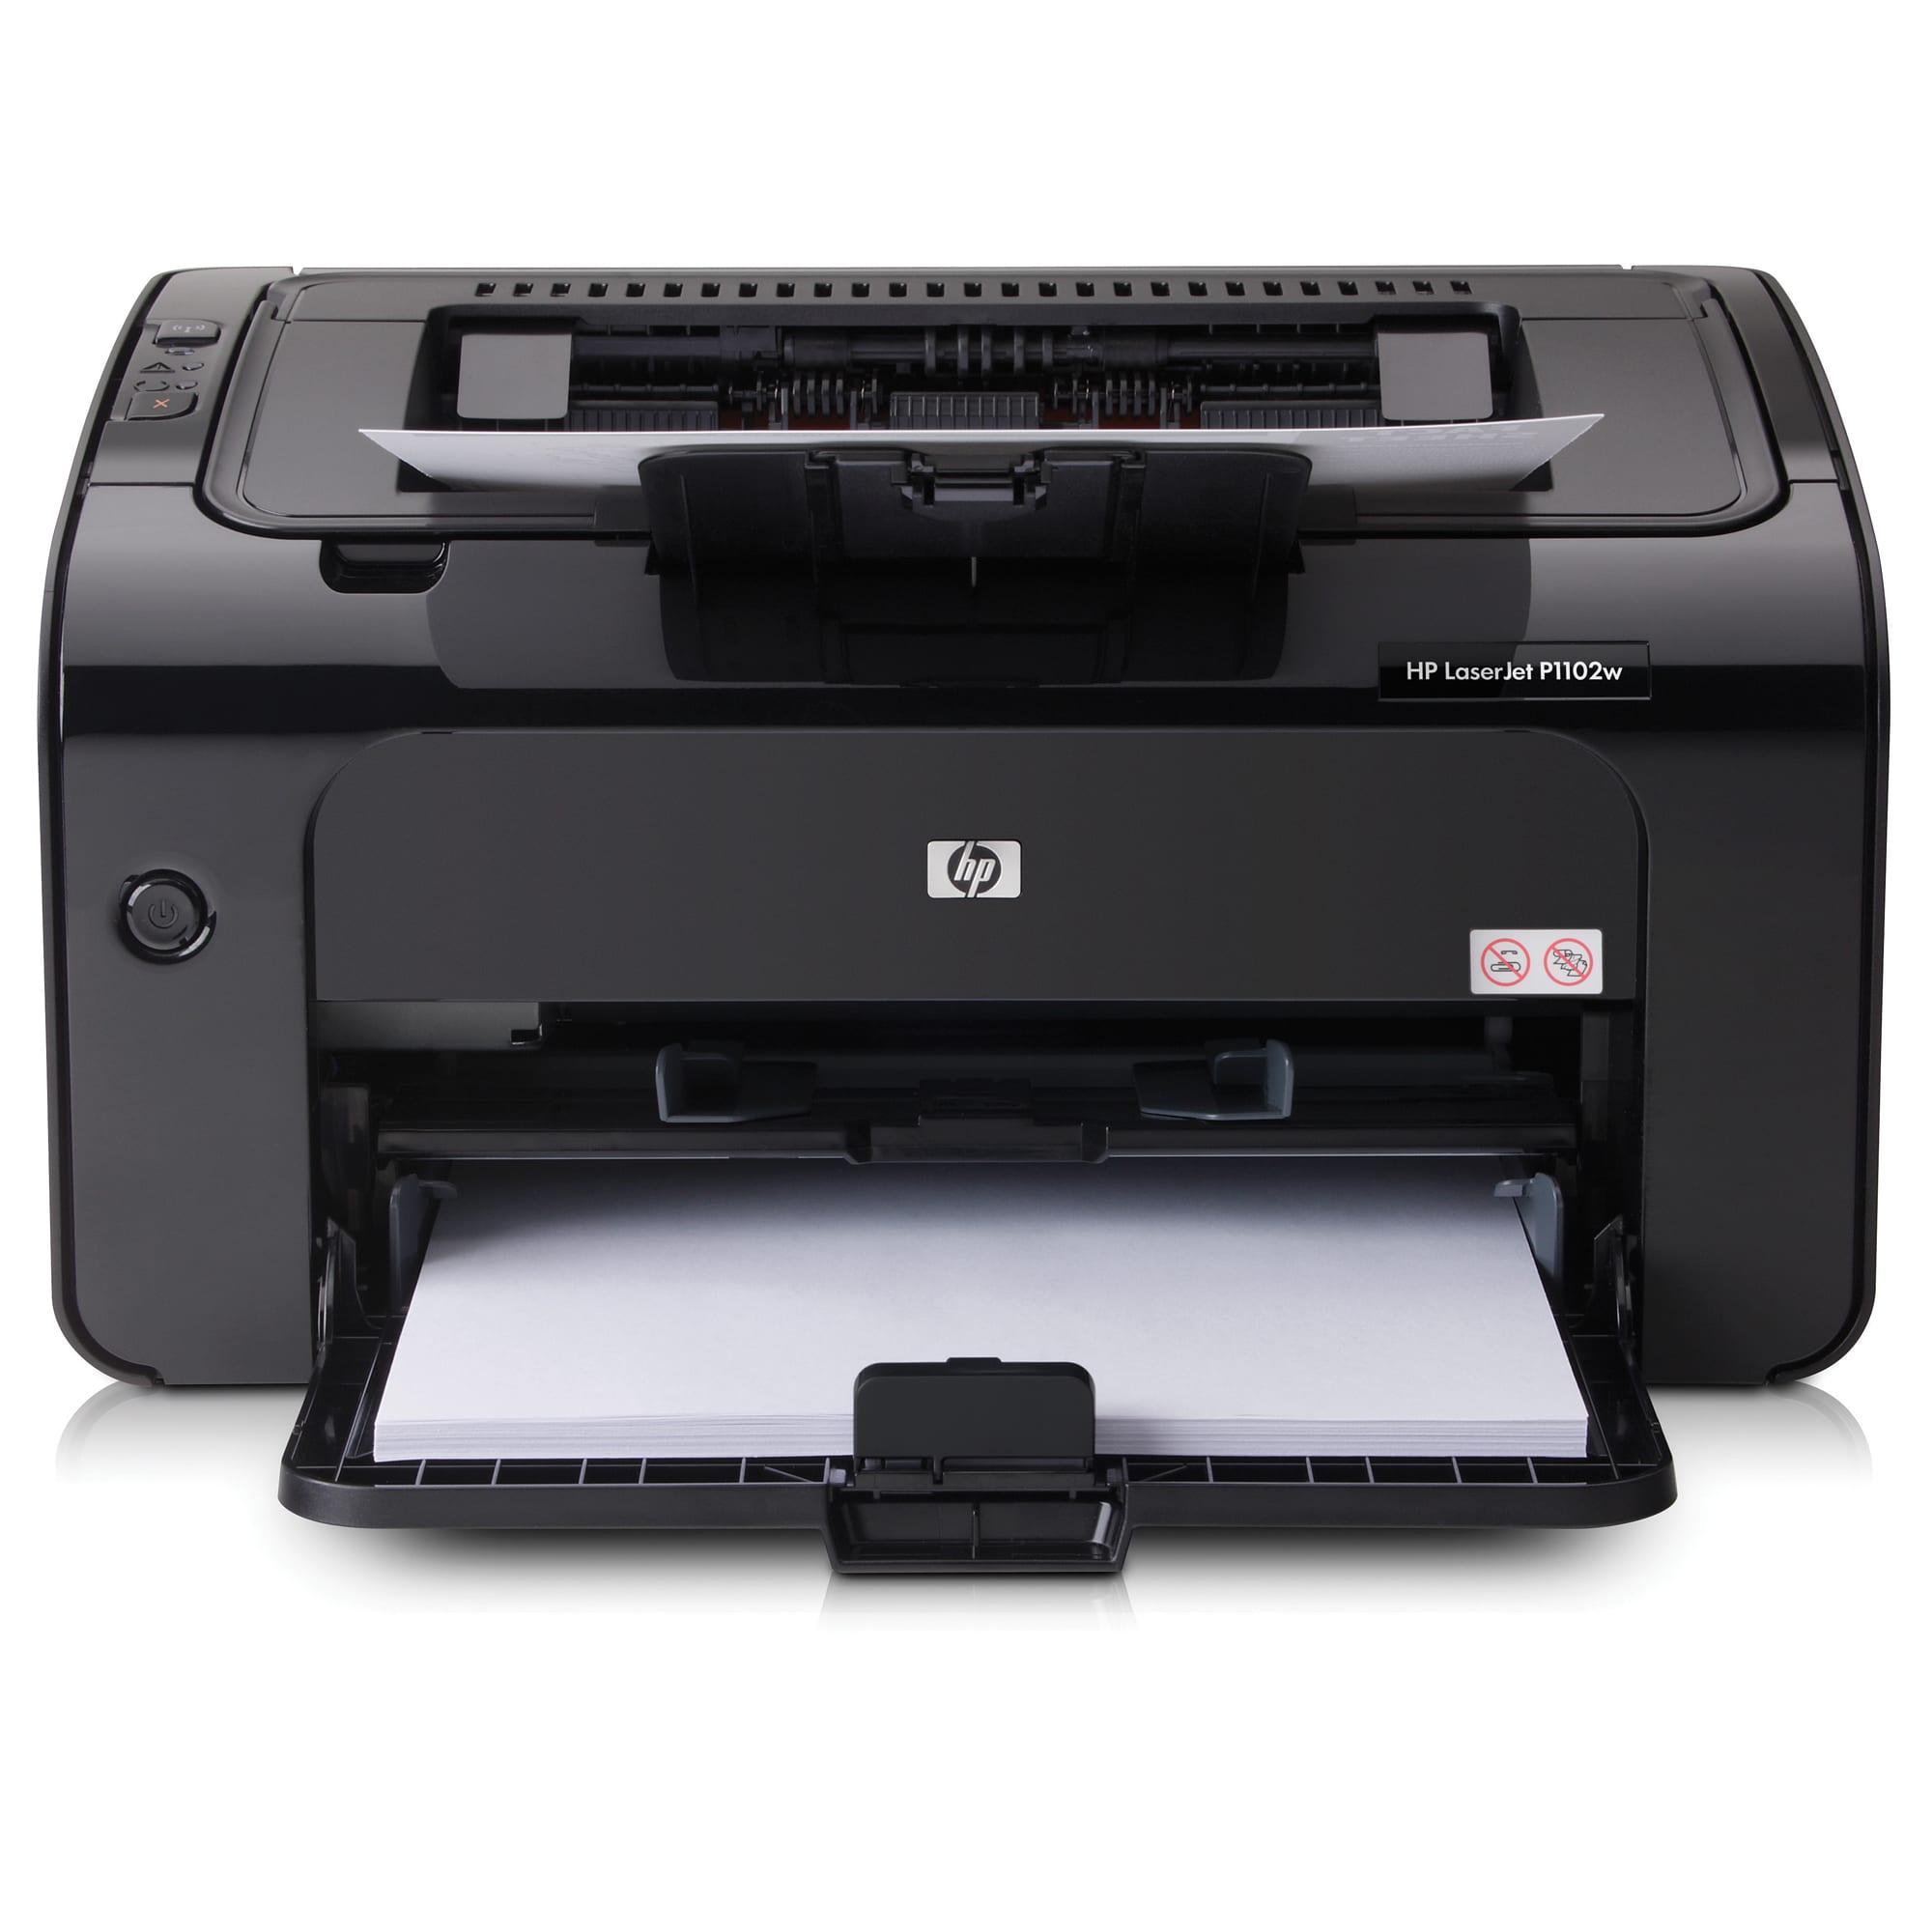 HP LaserJet Pro Wireless Monochrome Laser Printer, P1102w